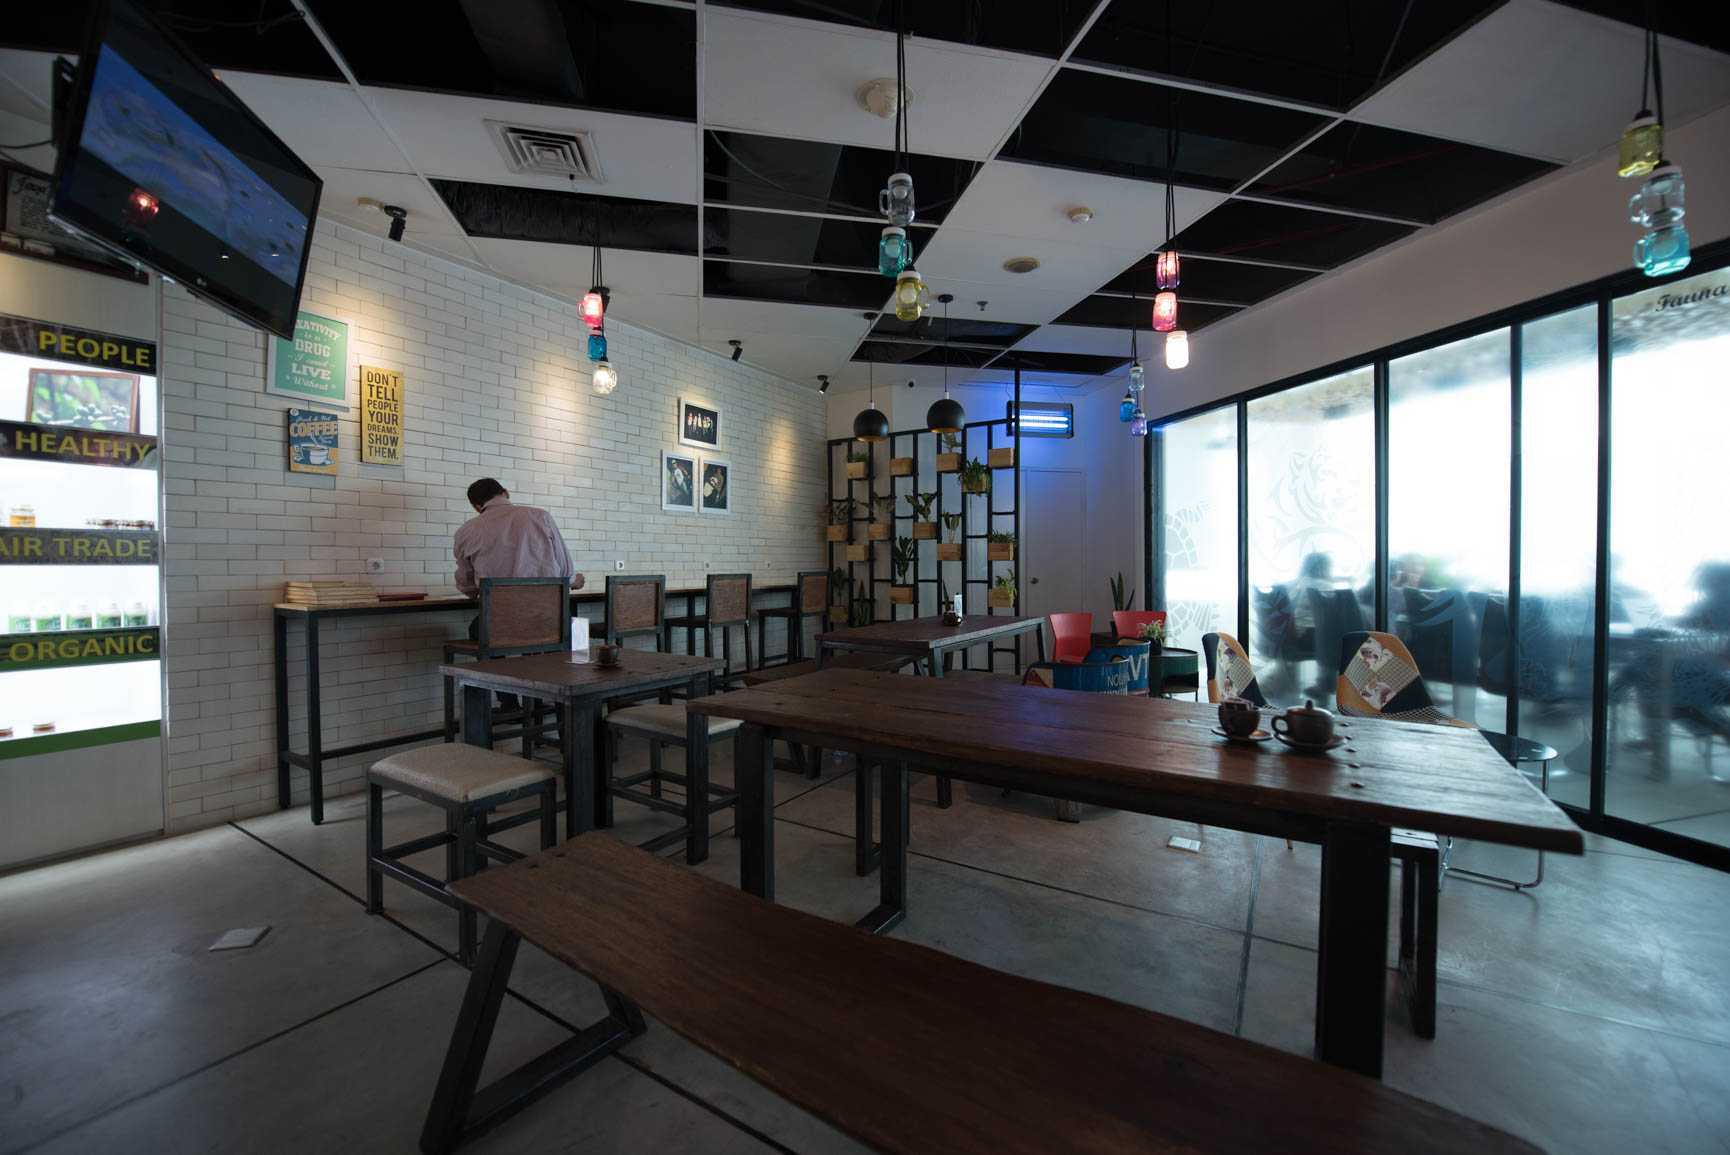 Jerry M. Febrino Cafe Panda House Graha Simatupang, Jl. T. B. Simatupang No.kav38, Jati Padang, Pasar Minggu, South Jakarta City, Jakarta 12540, Indonesia  Seating Area Interior View Industrial  38102